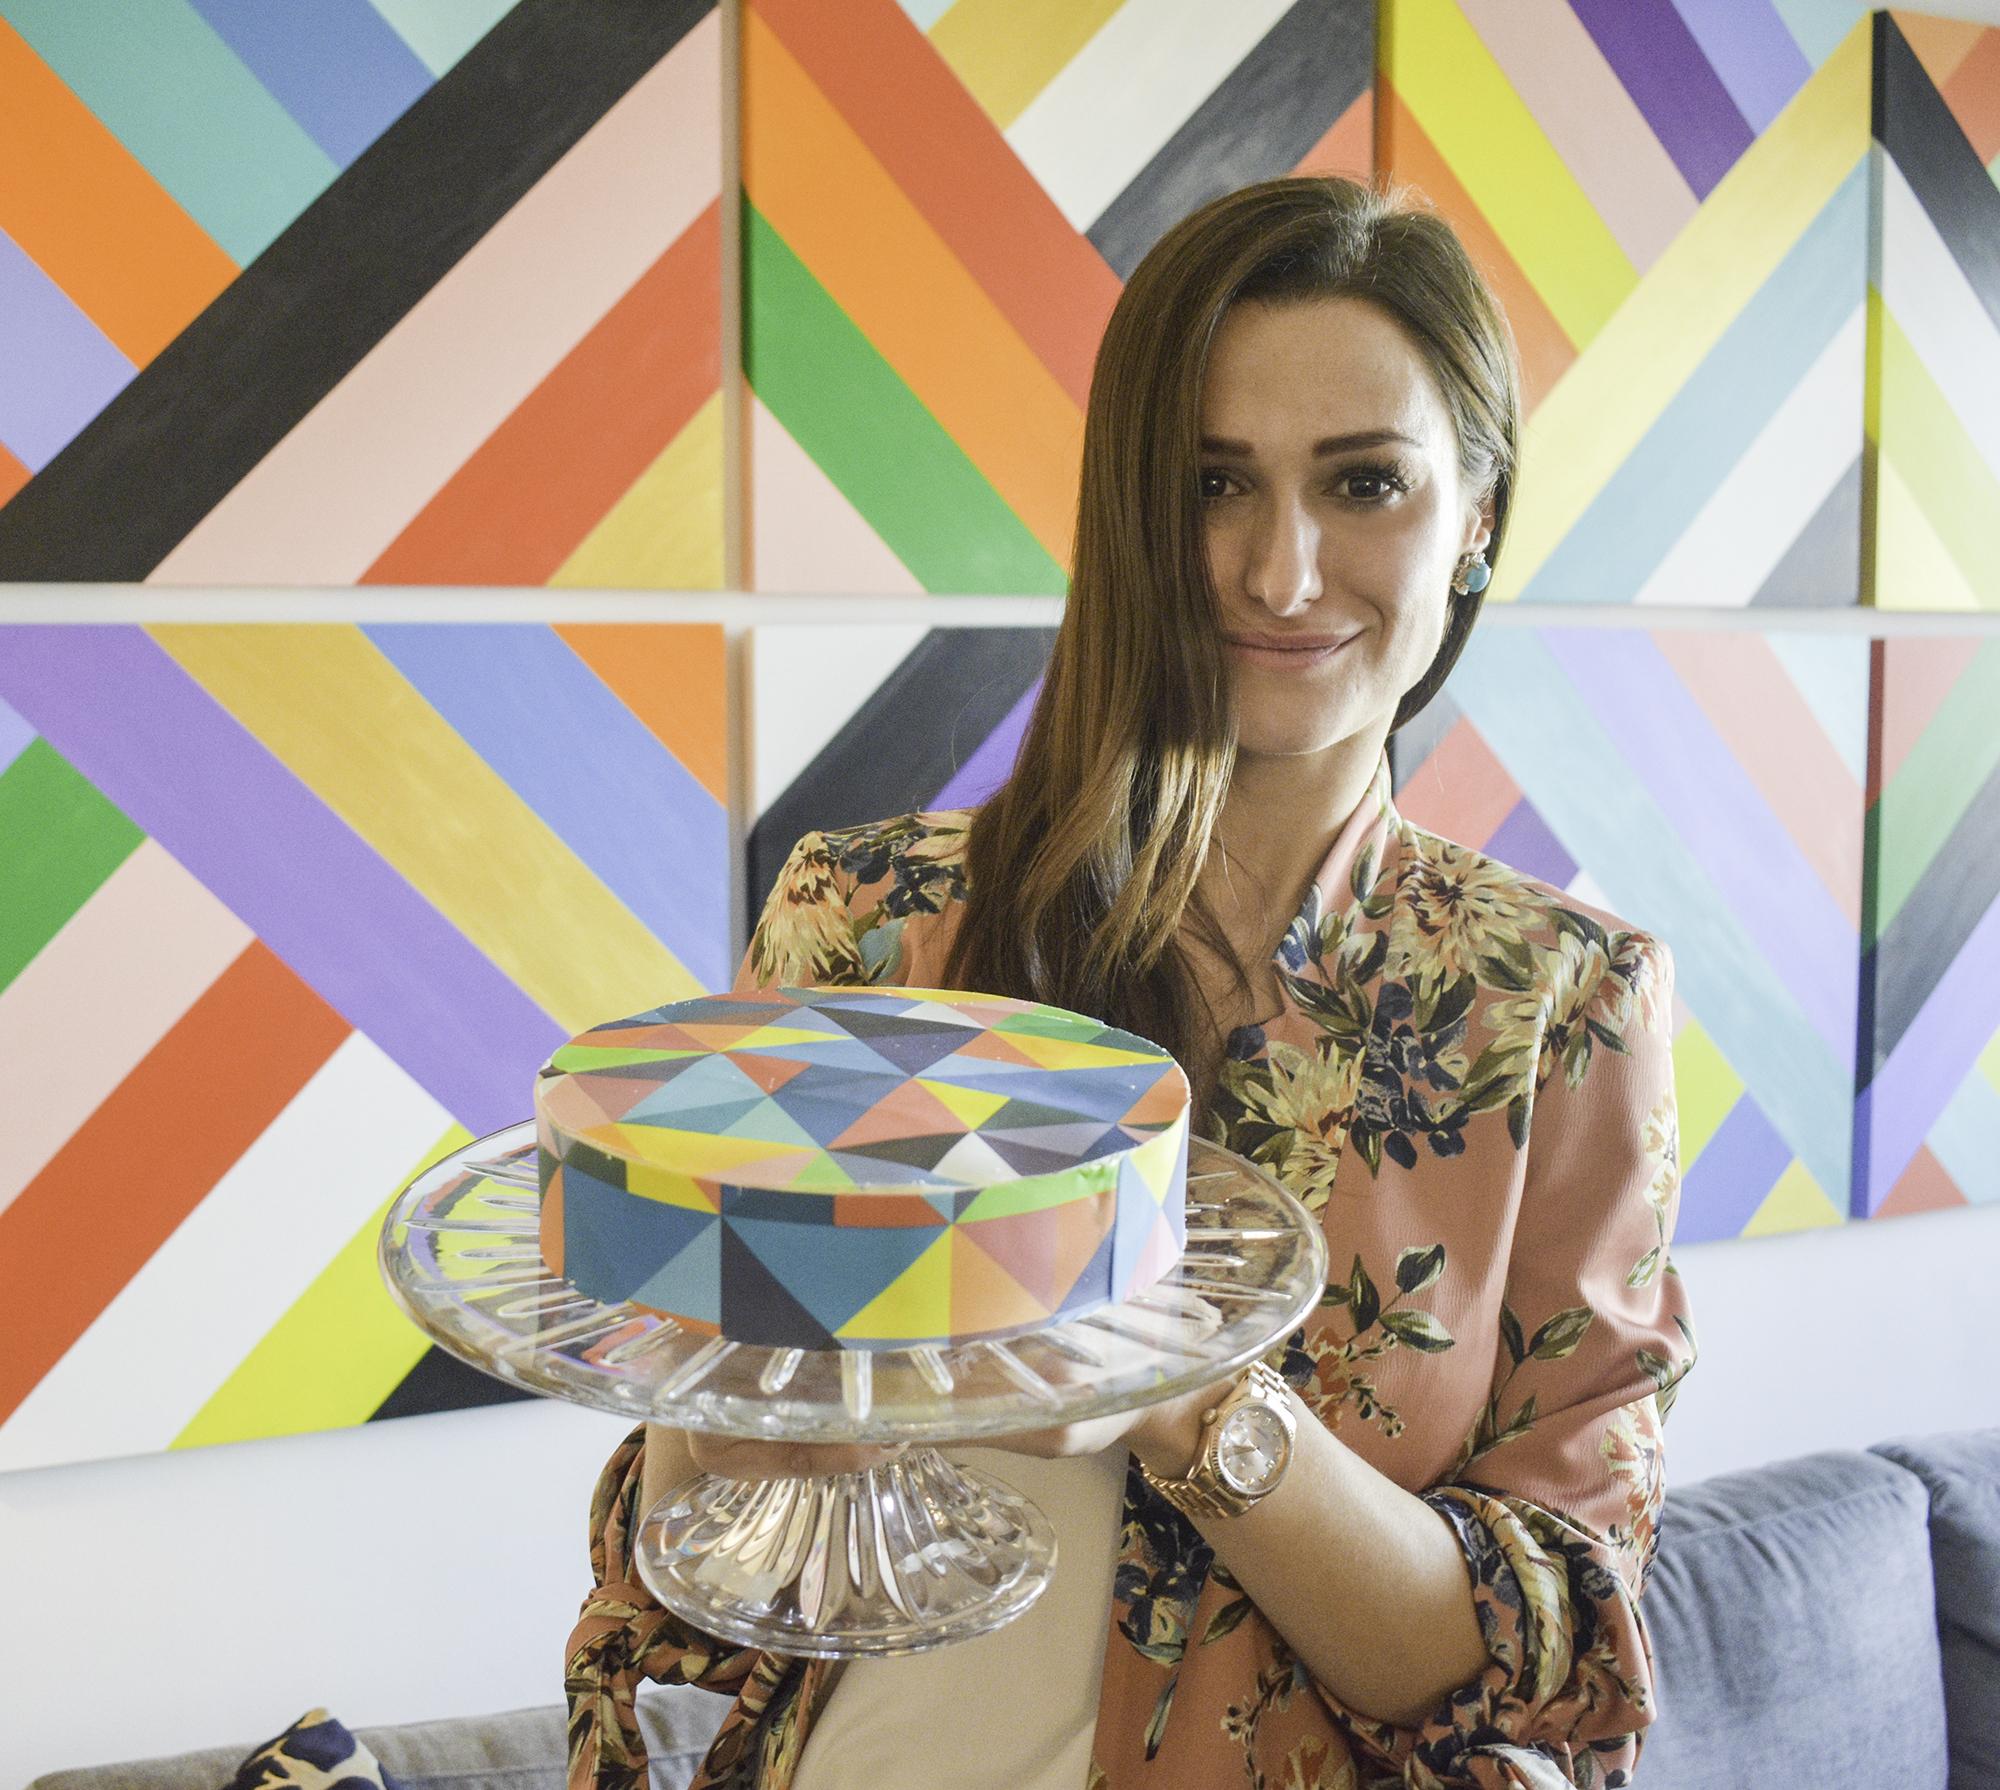 Vanilla Cake  with  Chefanie Sheets  inspired by Elizabeth Sutton's rainbow graphic work